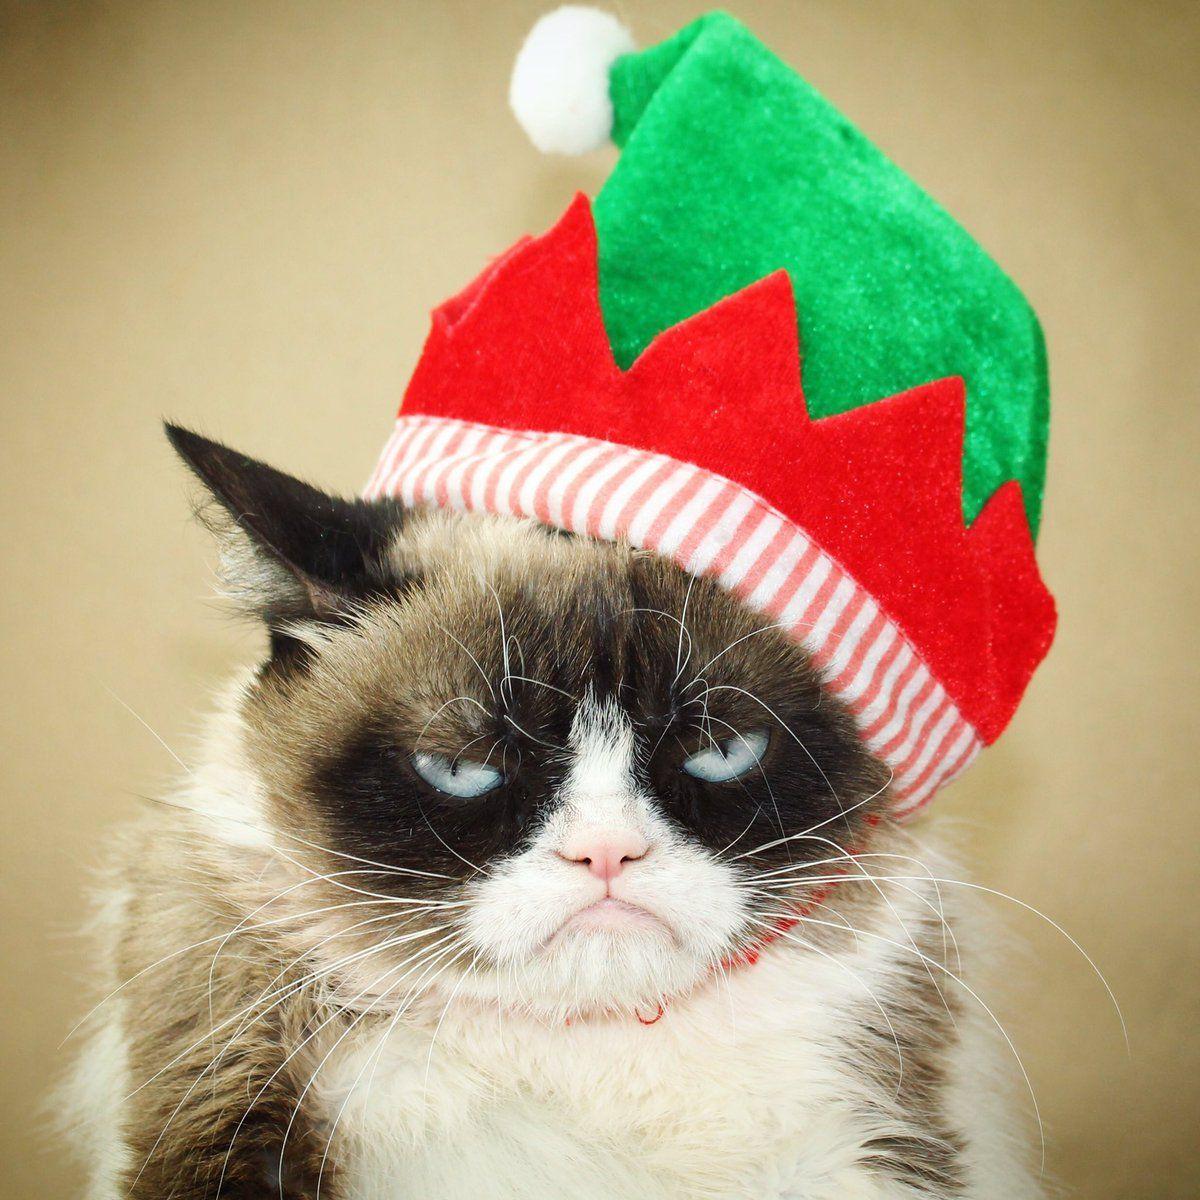 Grumpy Cat (RealGrumpyCat) Twitter GOOD OL GRUMPY